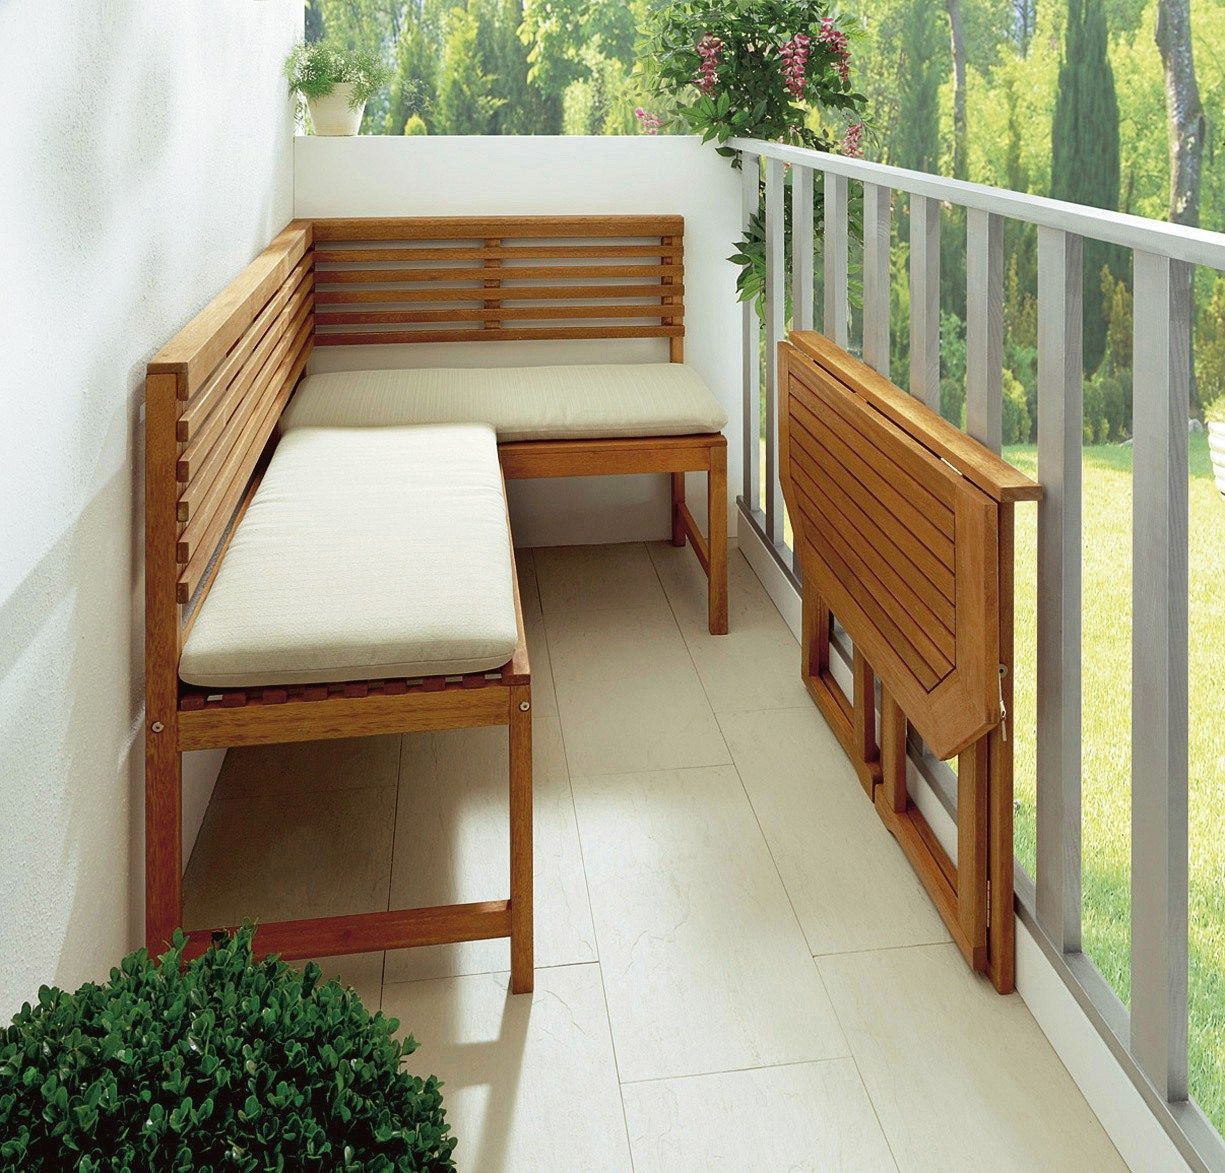 Klapptisch balkon ikea  Balkon Klapptisch Holz Ikea | terraza | Pinterest